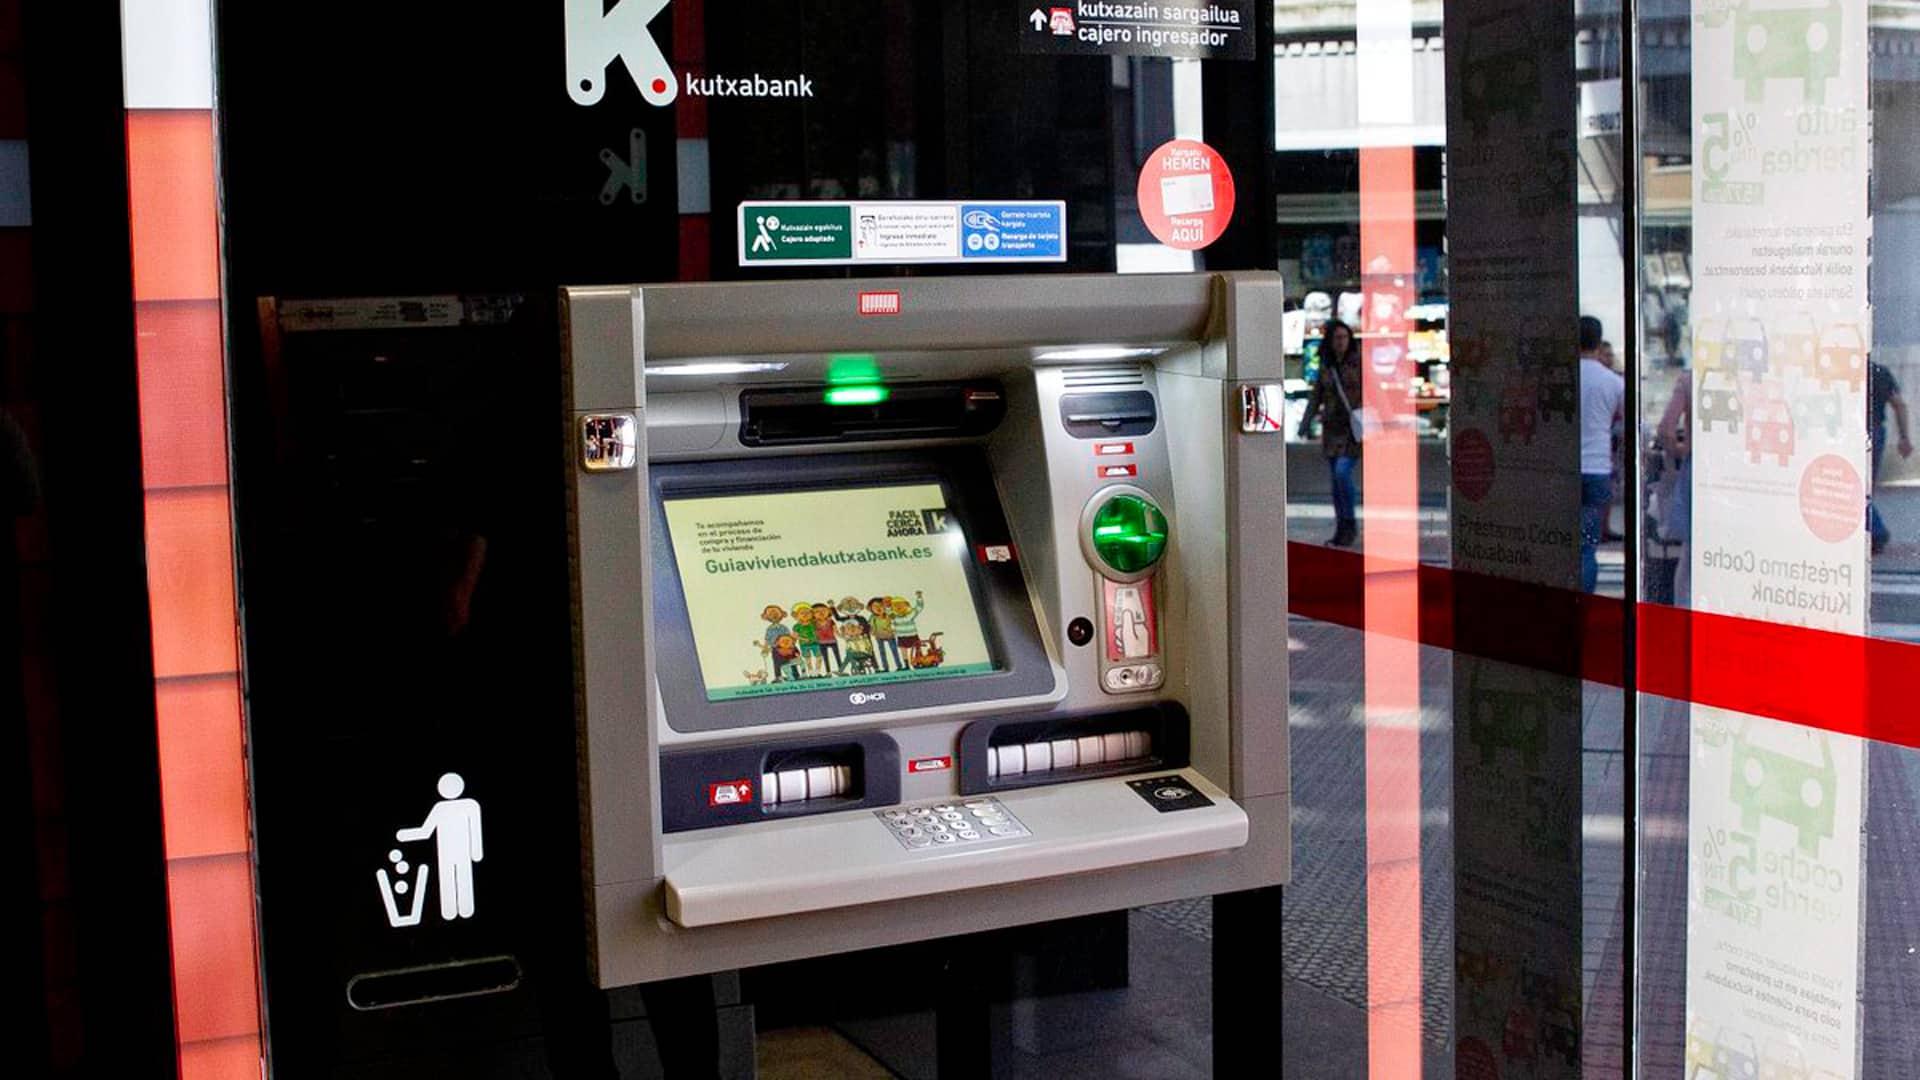 Sacar dinero sin tarjeta Kutxabank: cómo hacerlo